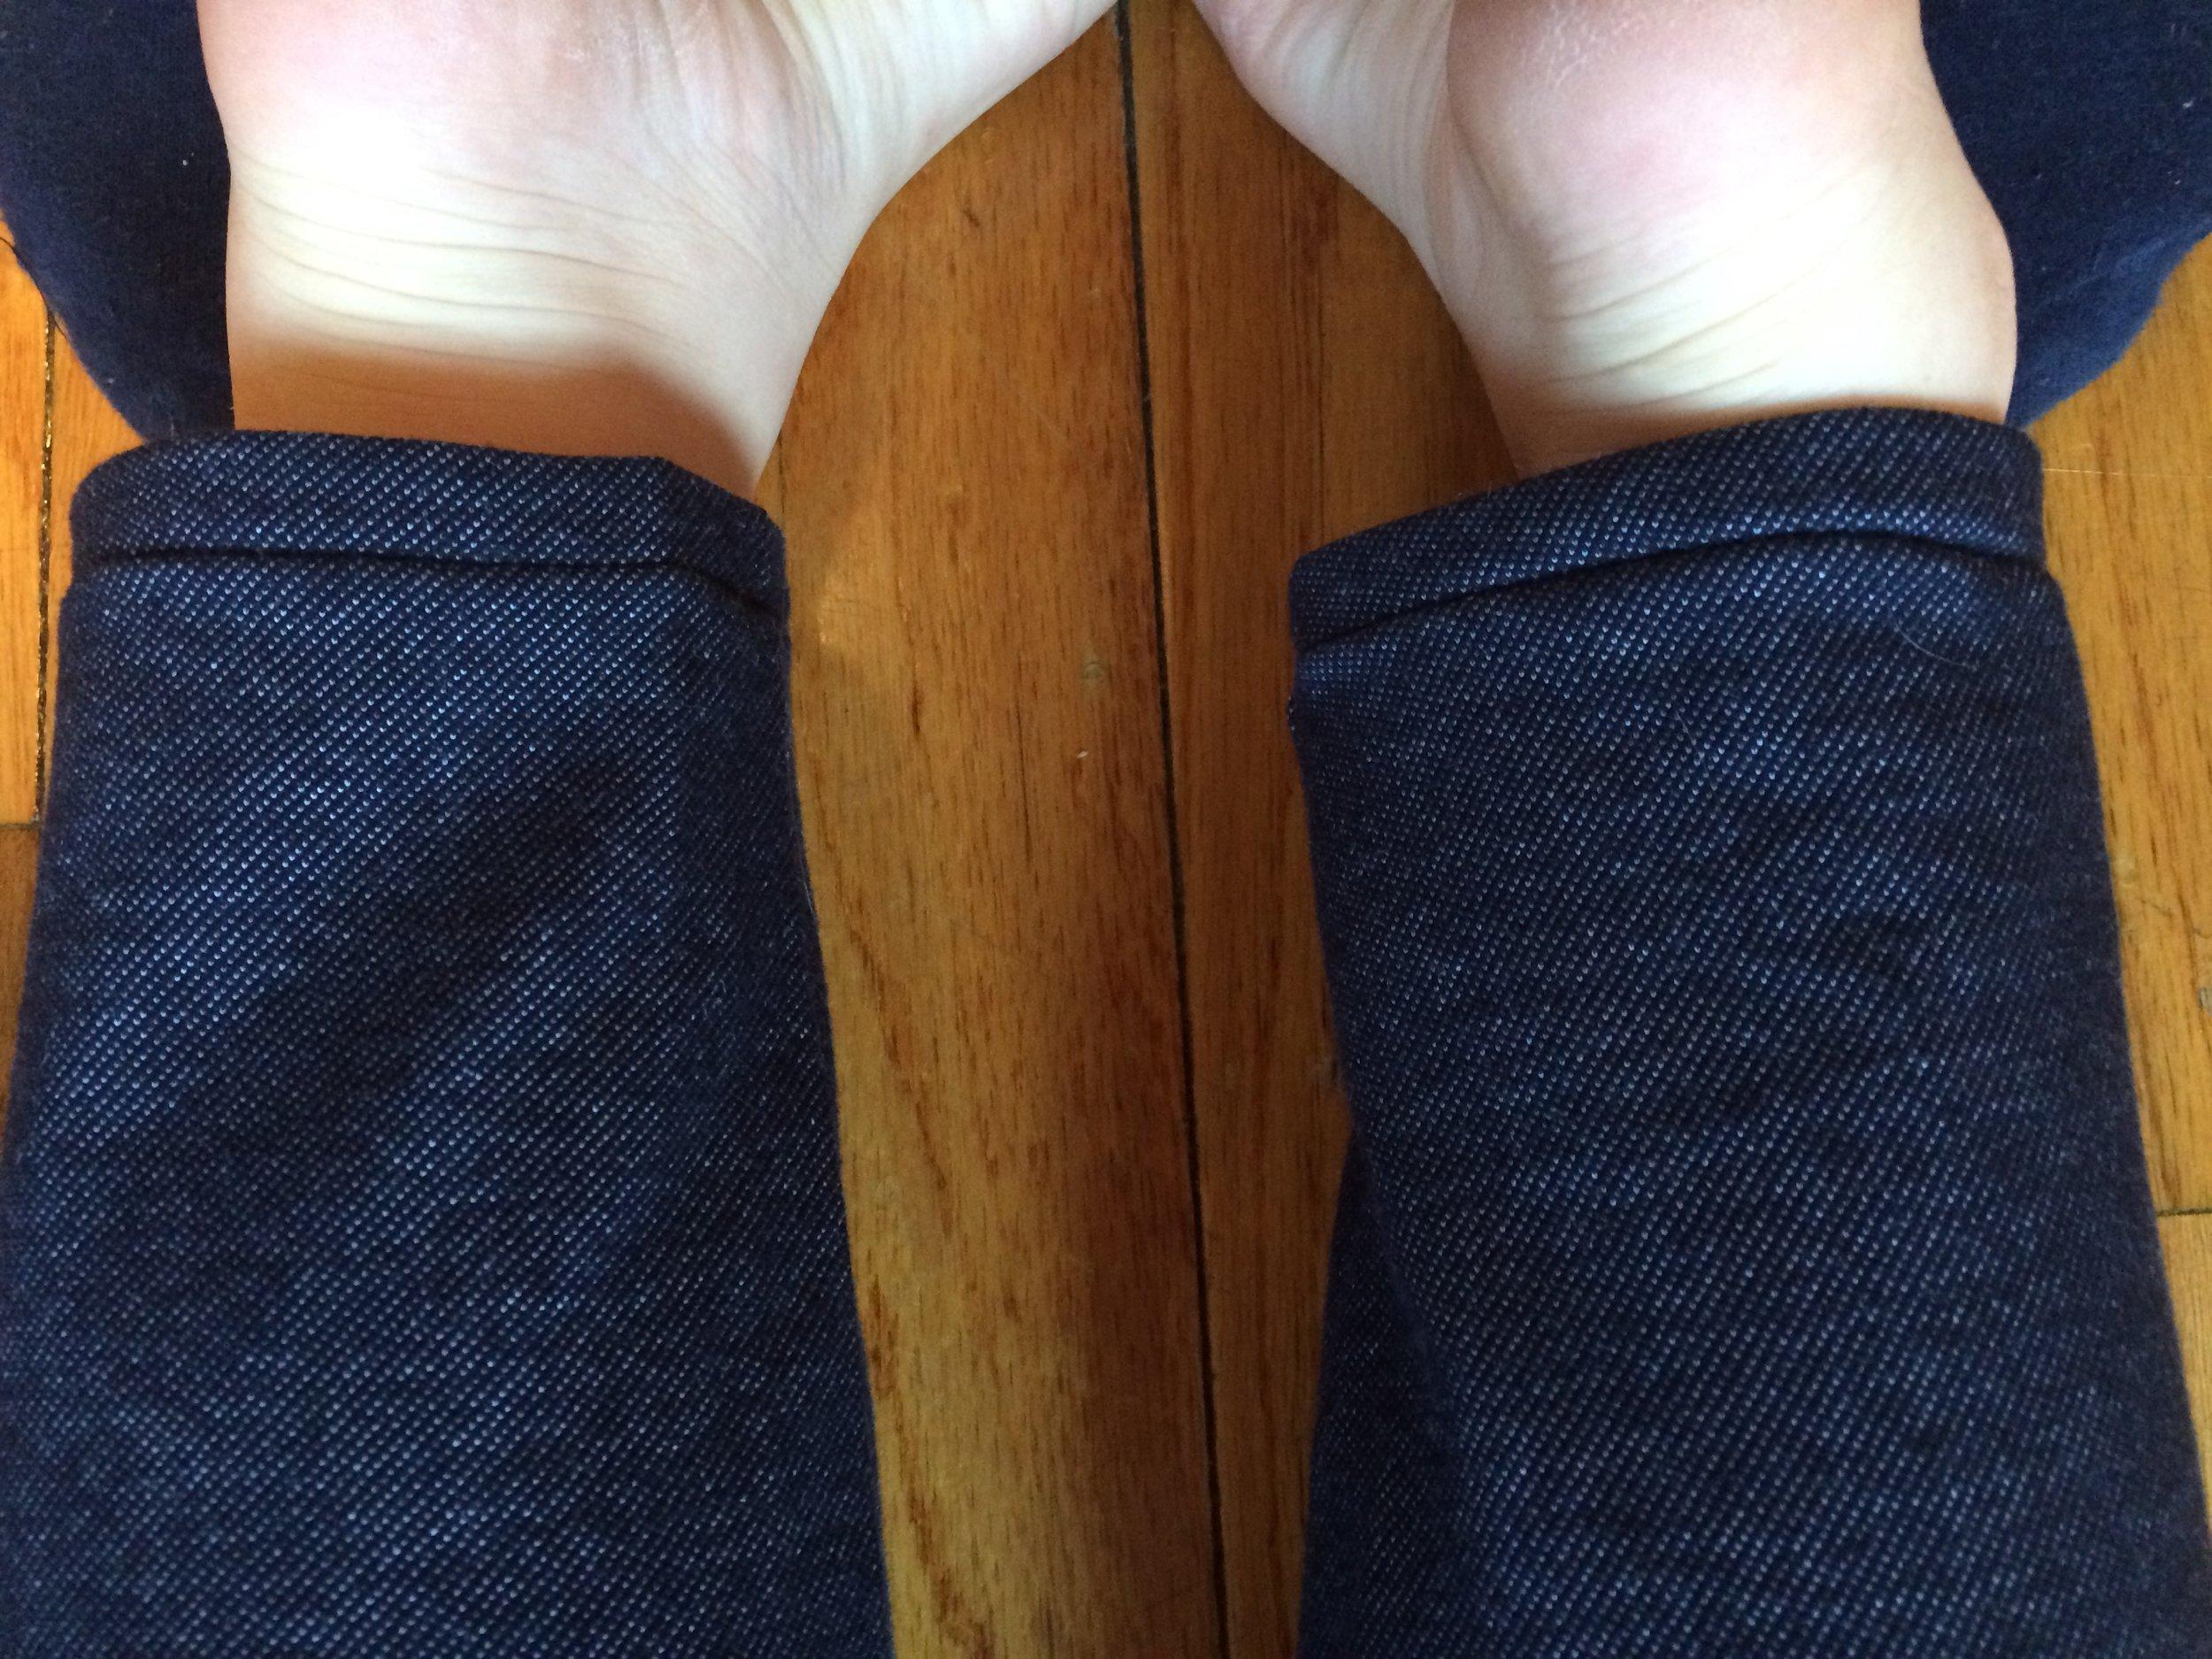 Small triumph - pants that don't puddle